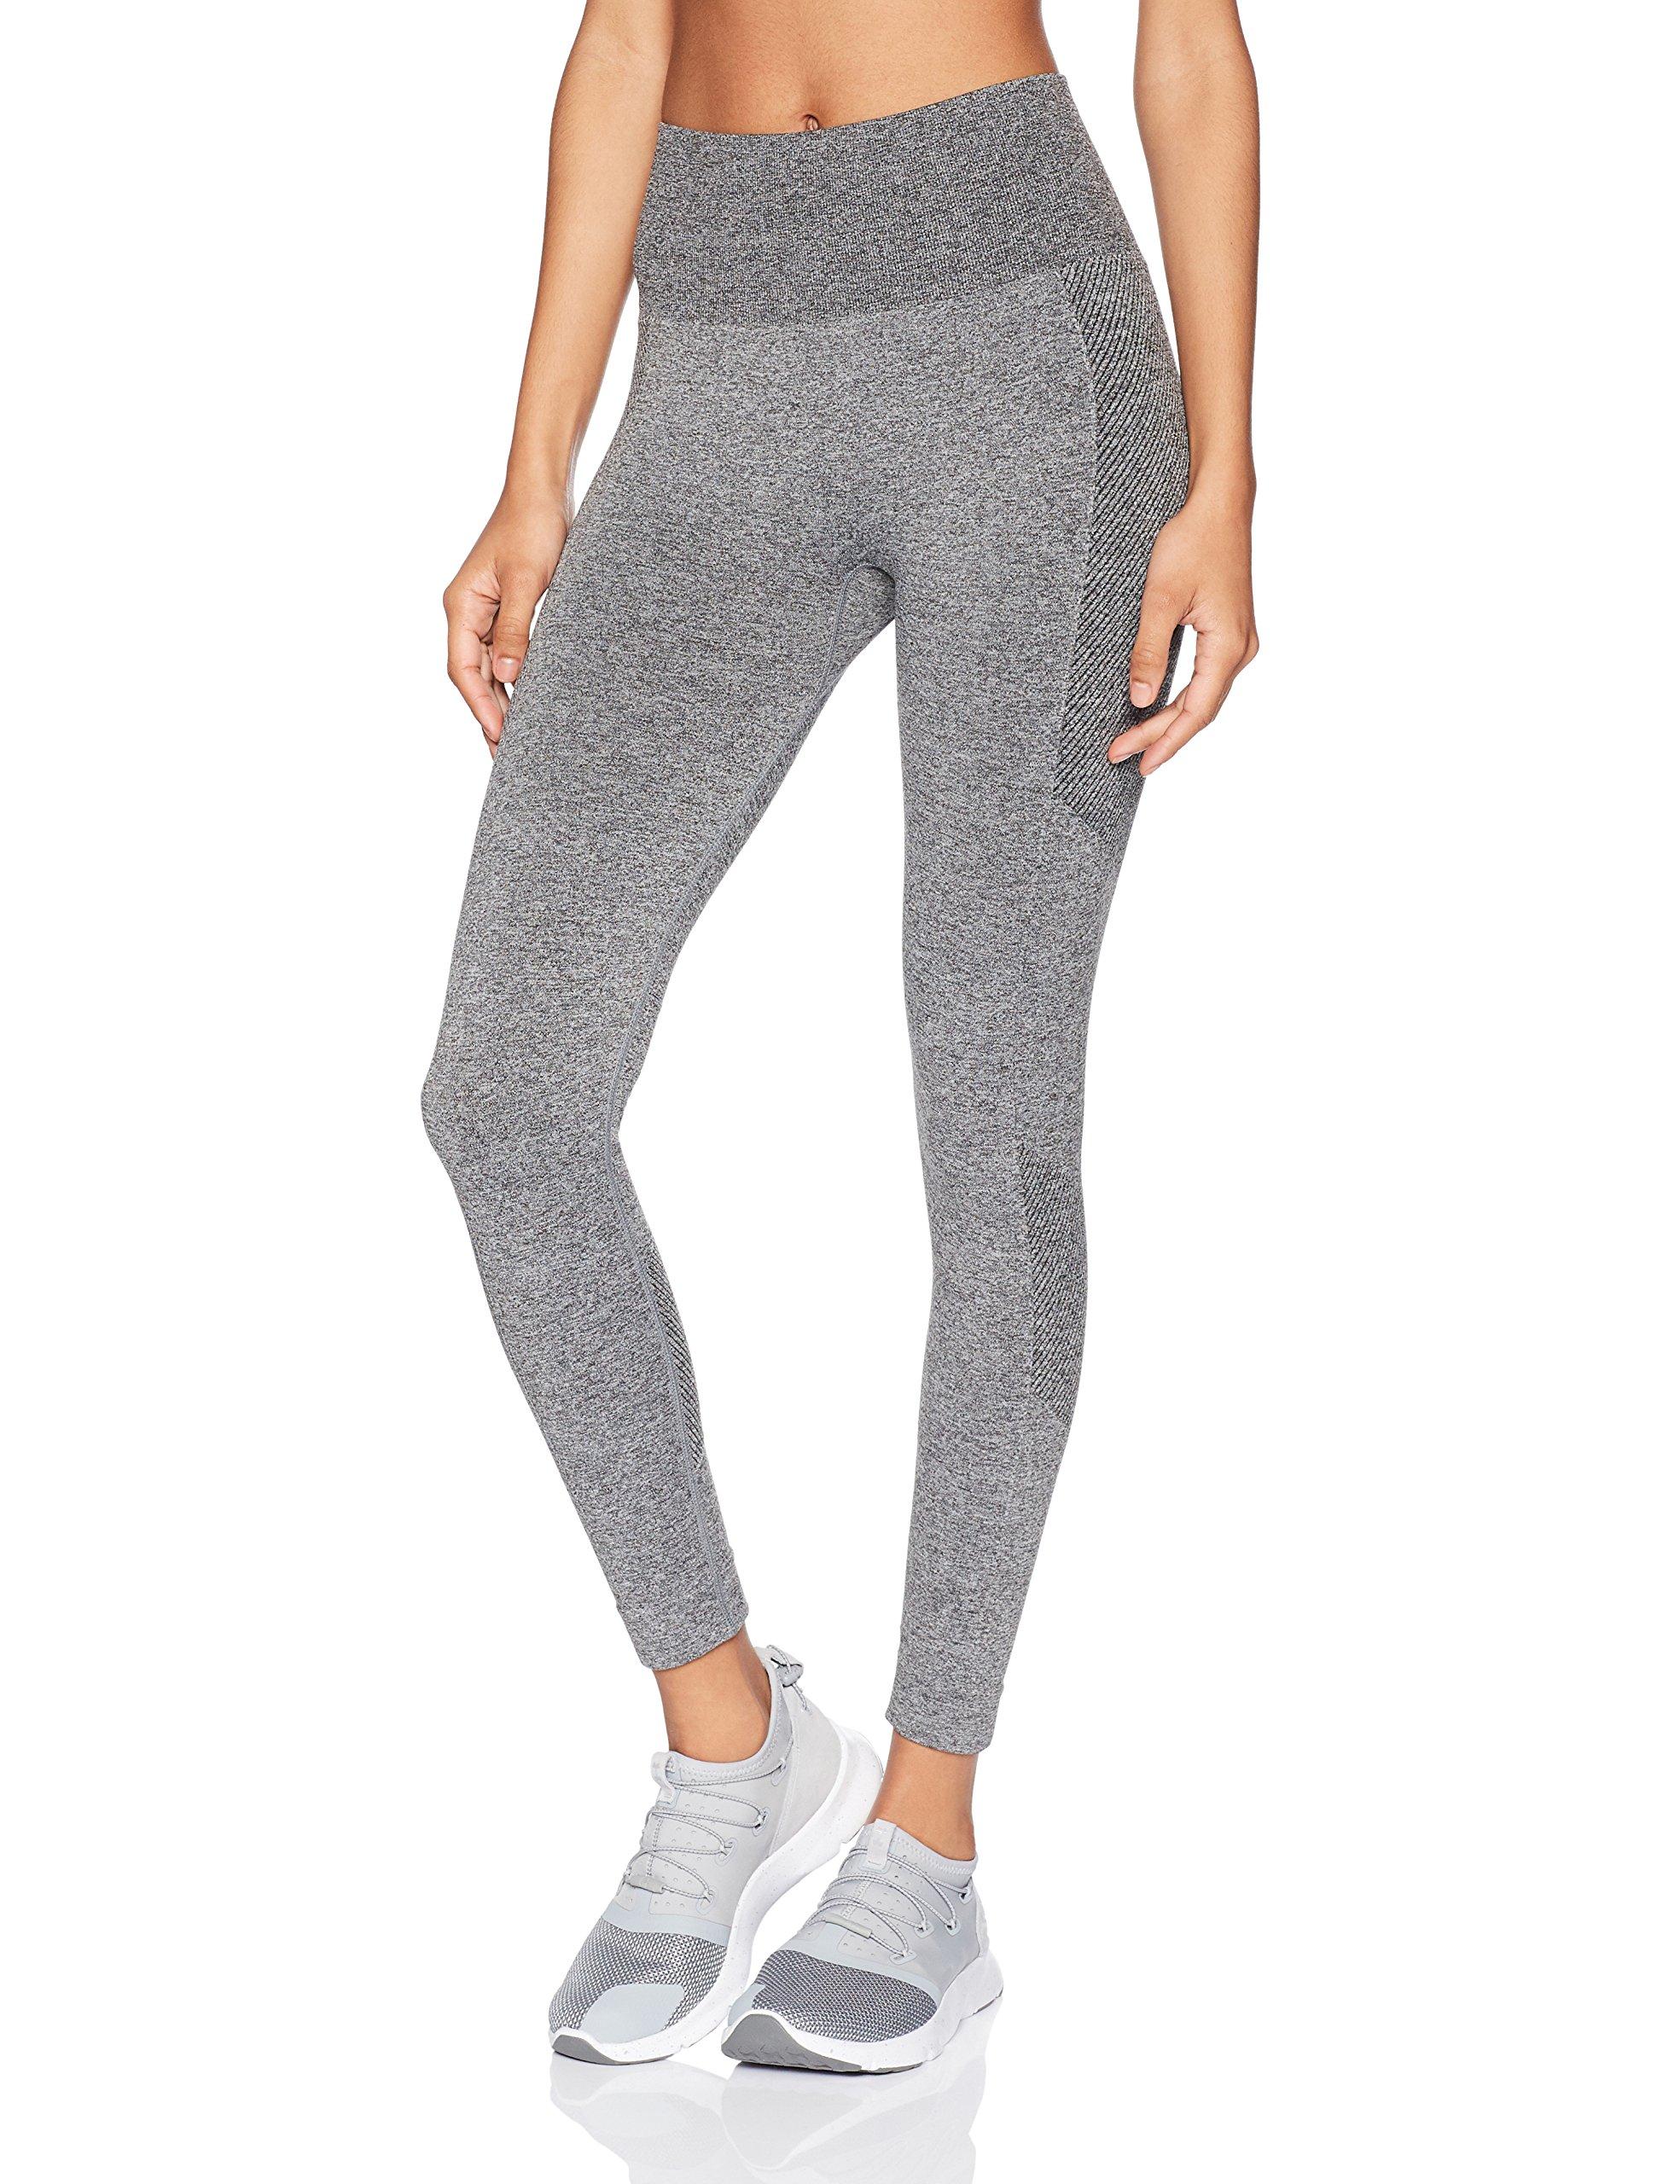 Starter Women's 25'' Seamless Light-Compression Cropped Workout Legging, Prime Exclusive, Iron Grey Jaspe, Medium